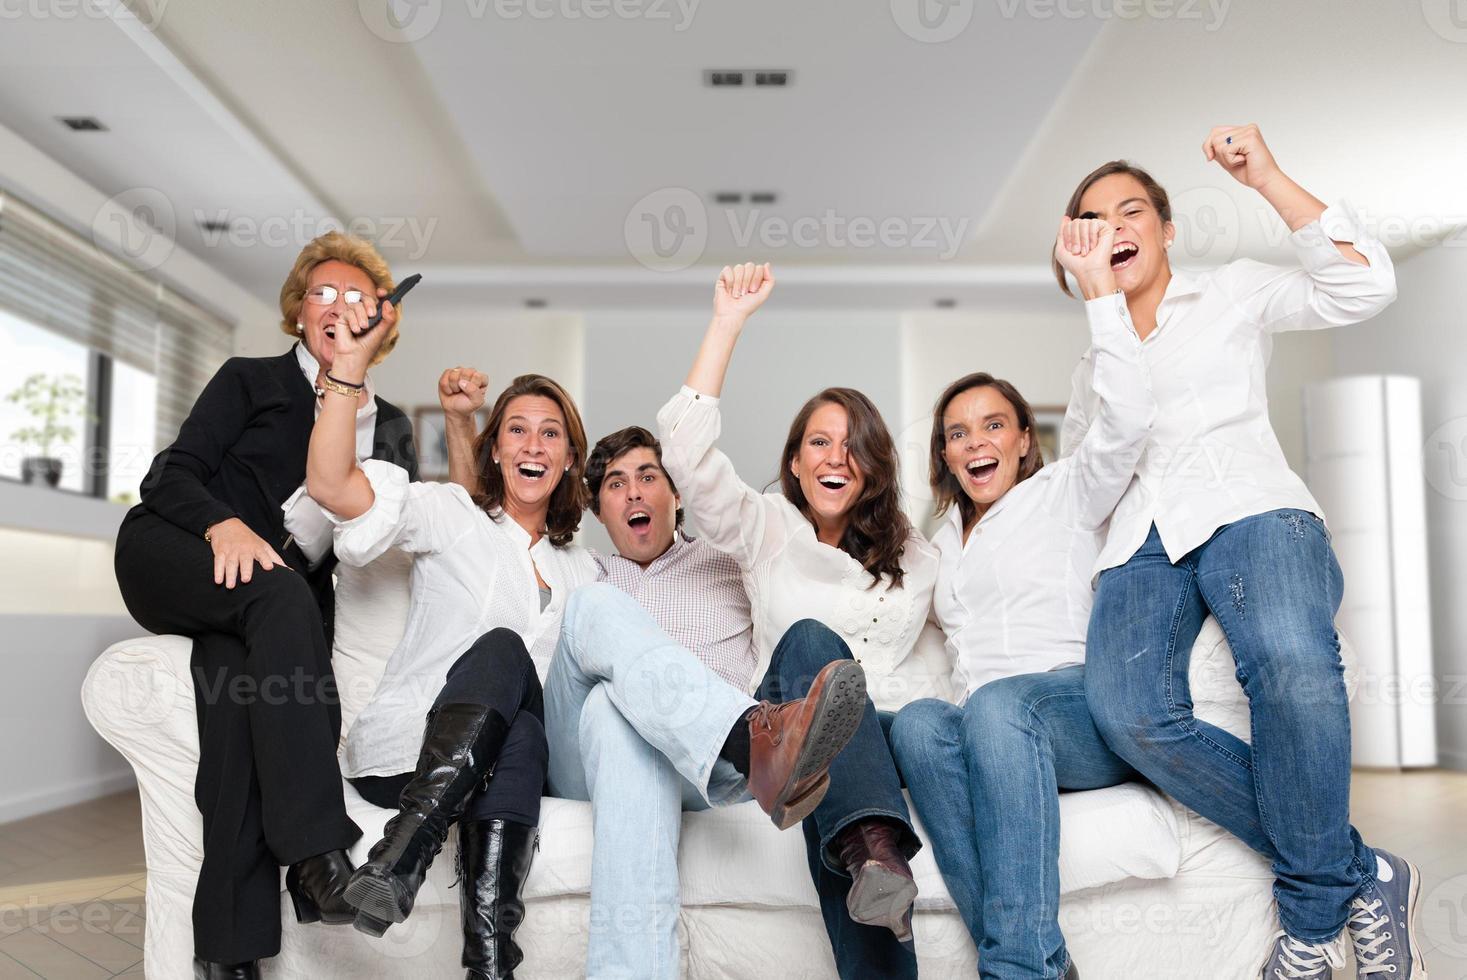 famille regardant un match gagnant photo